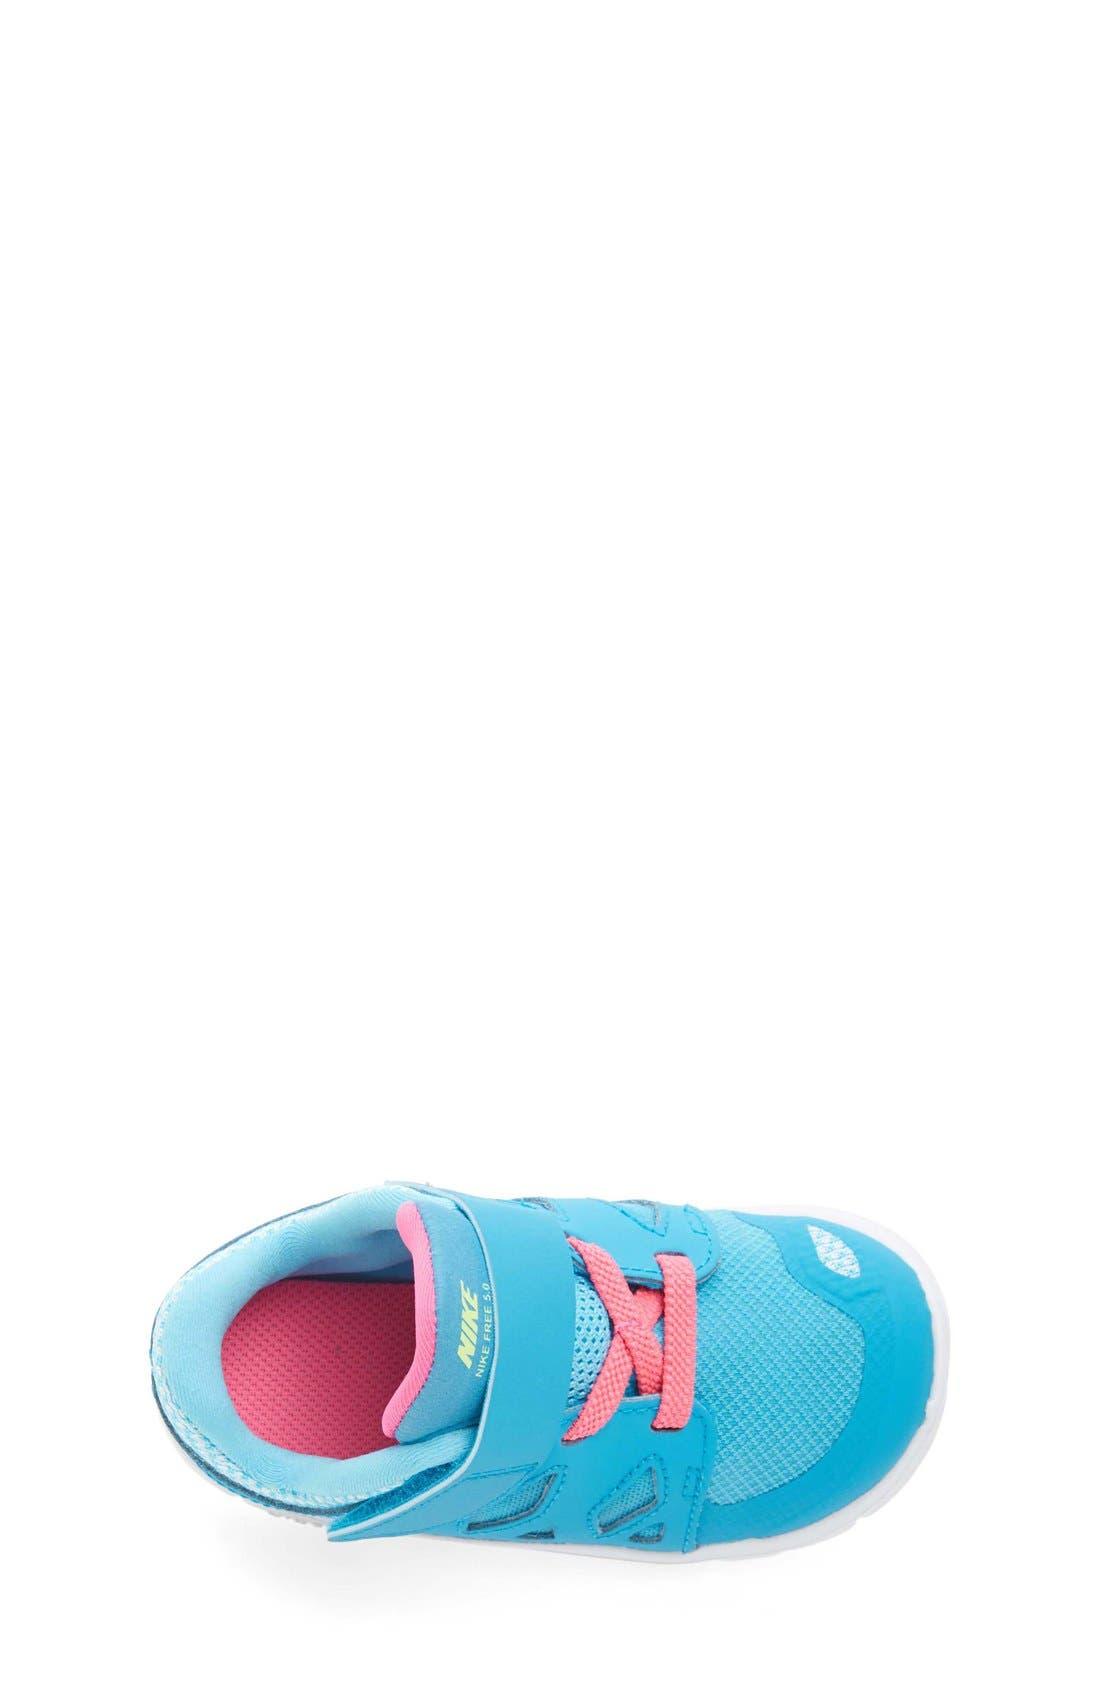 Alternate Image 3  - Nike 'Free 5' Athletic Shoe (Baby, Walker & Toddler)